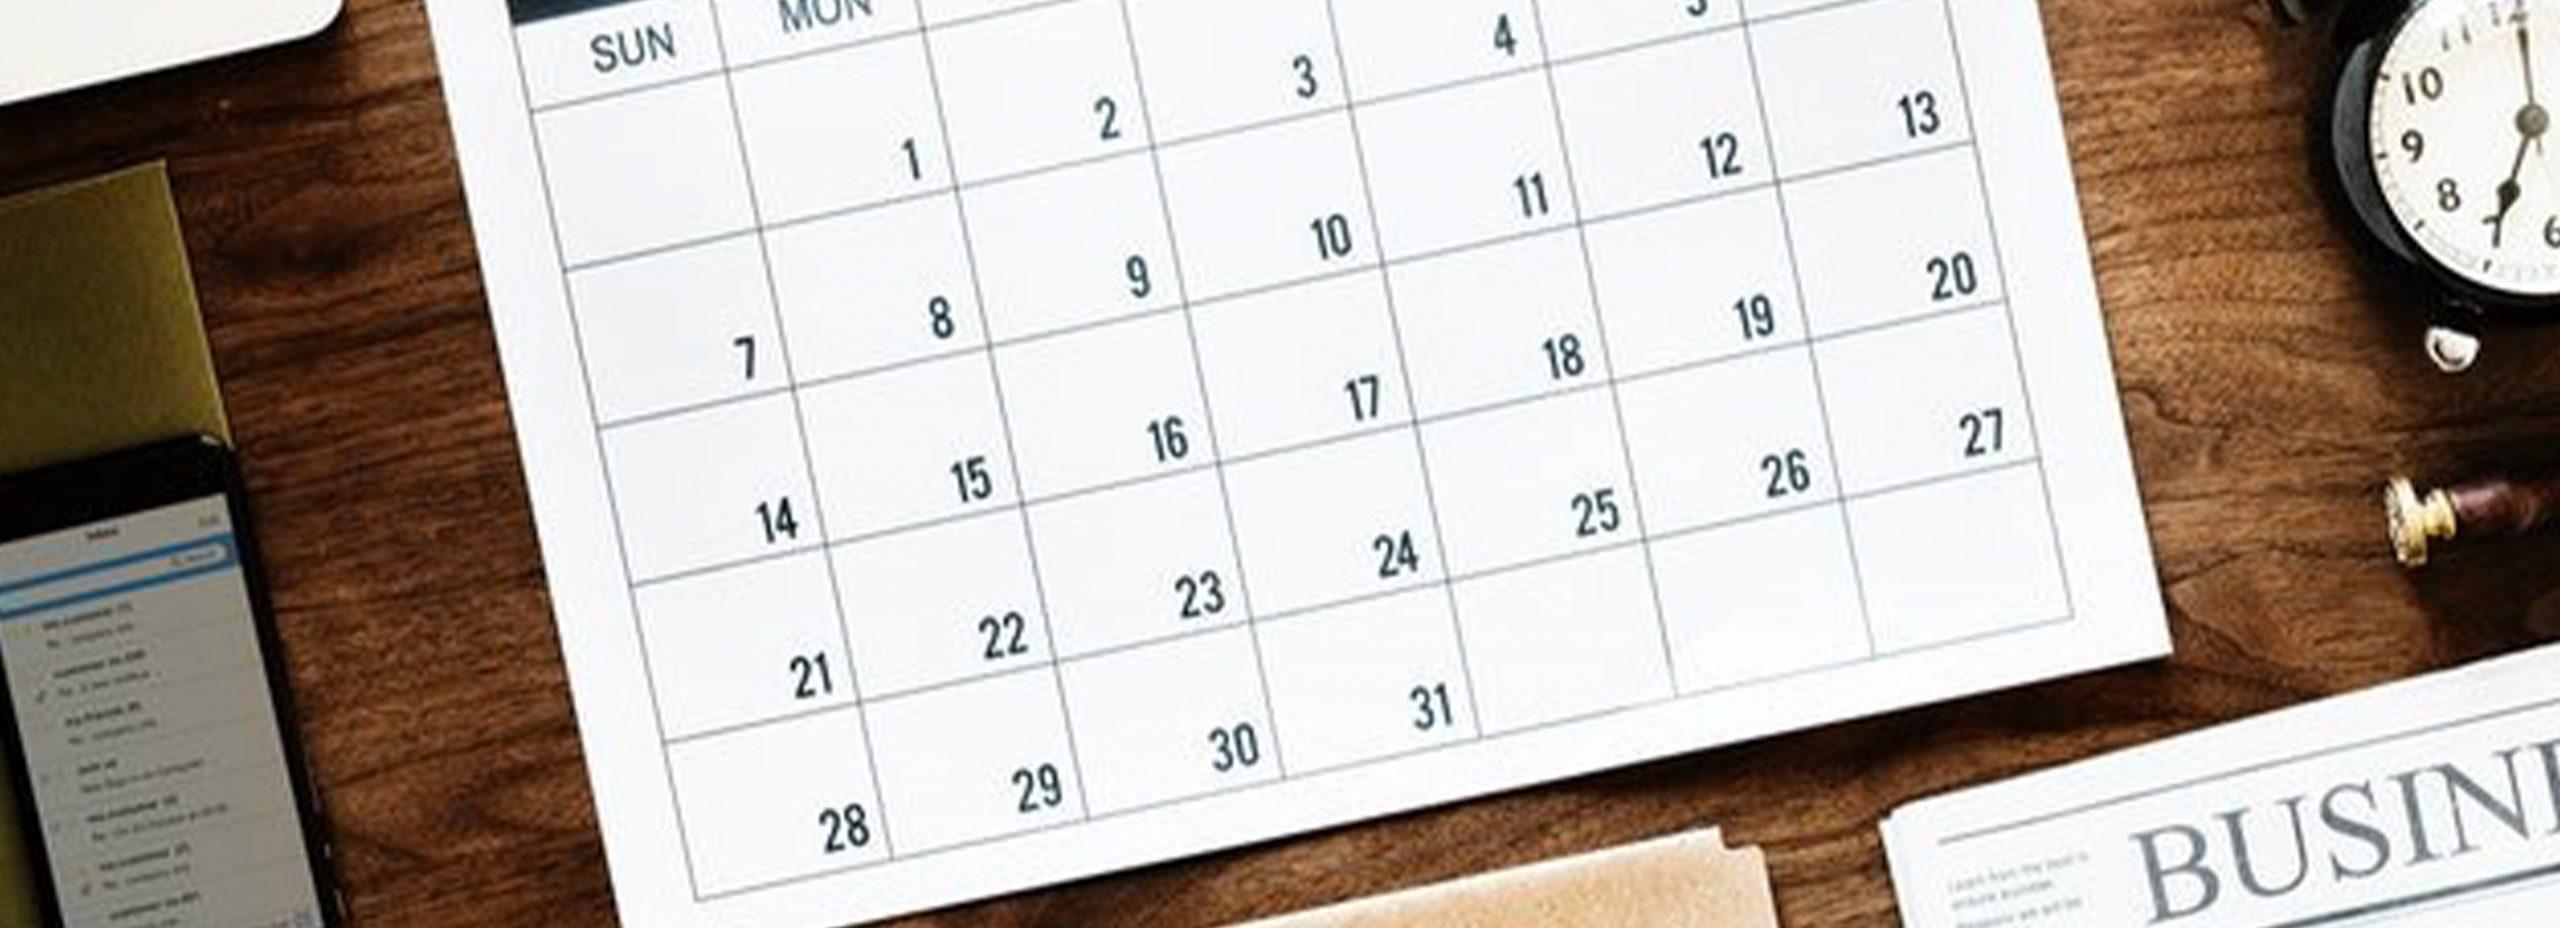 Bando INAIL 2019 – Click Day 2020: le date